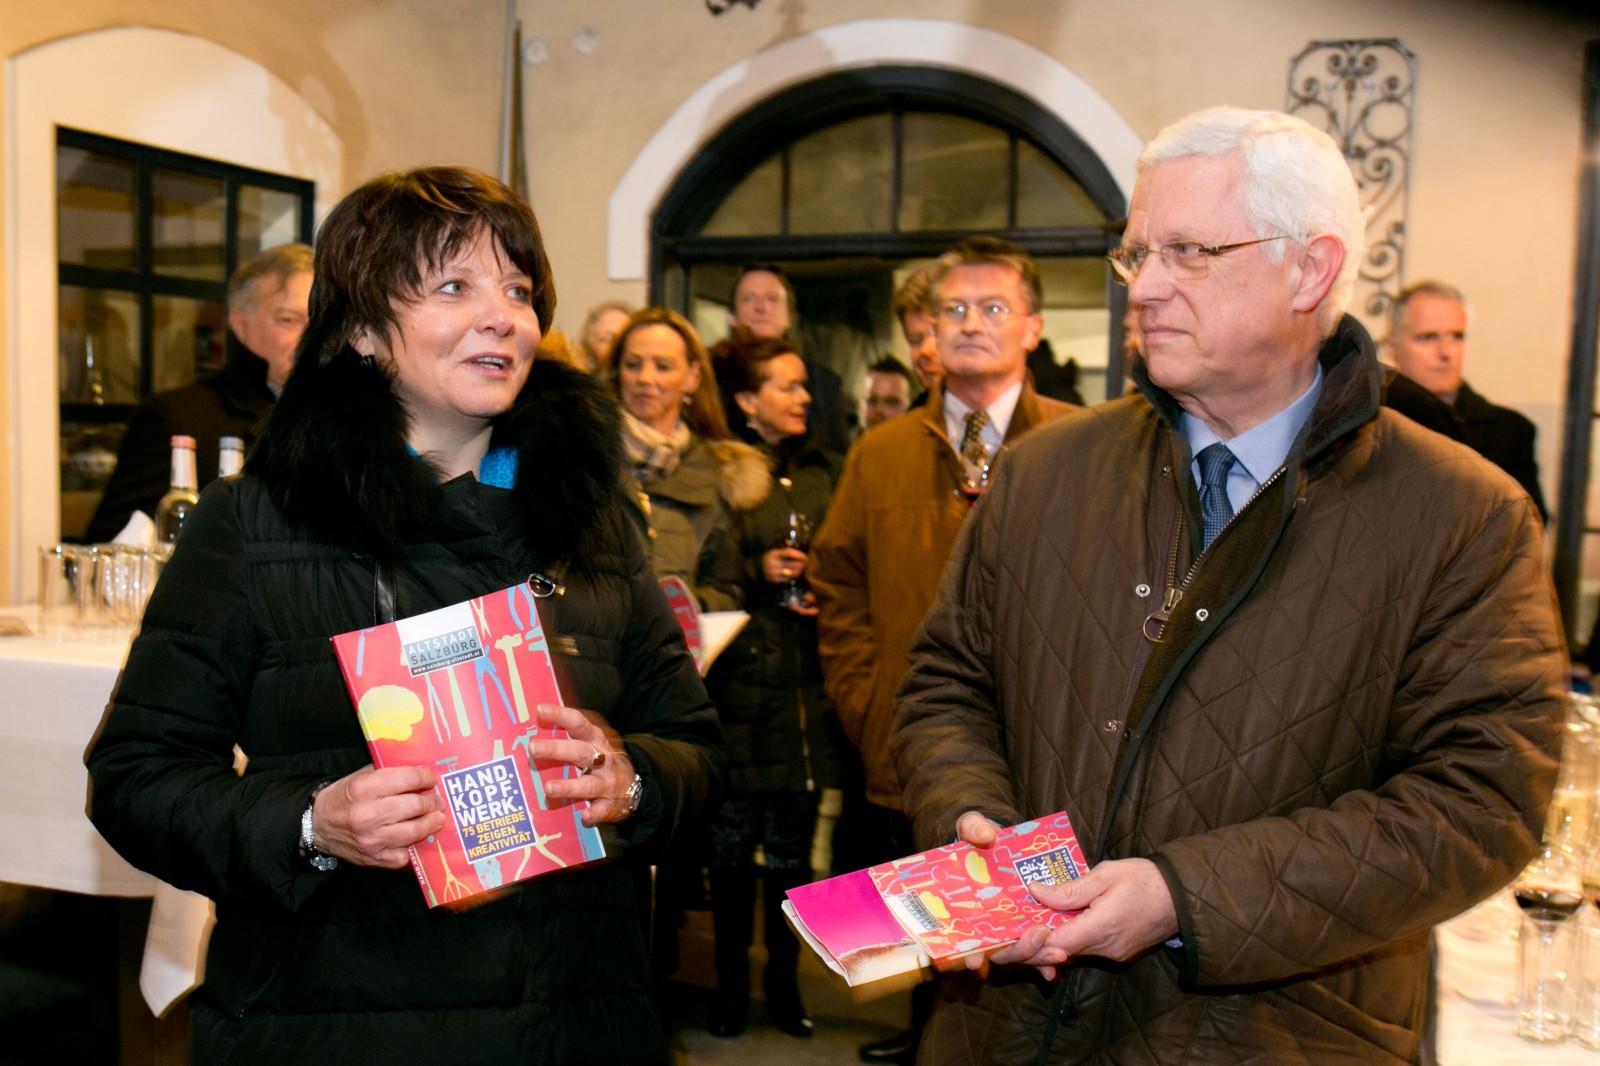 Die Veranstalter: Das Altstadt Marketing